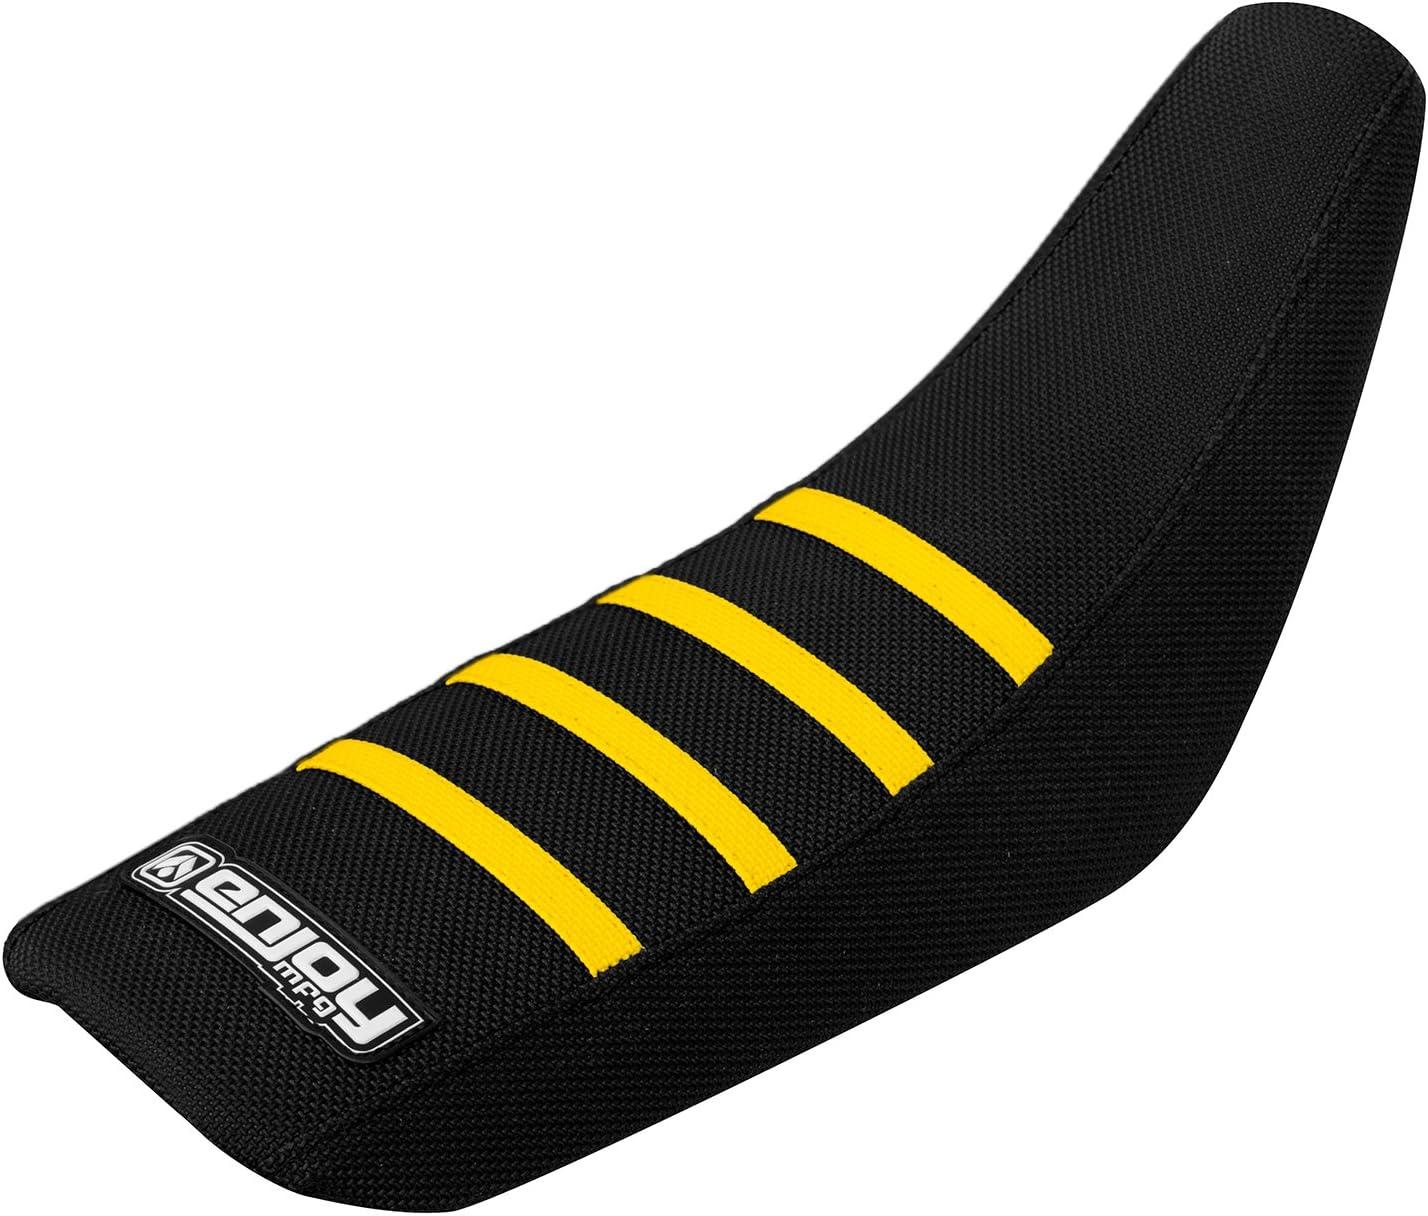 All Black Enjoy MFG Ribbed Seat Cover for Suzuki JR 50 Black Ribs